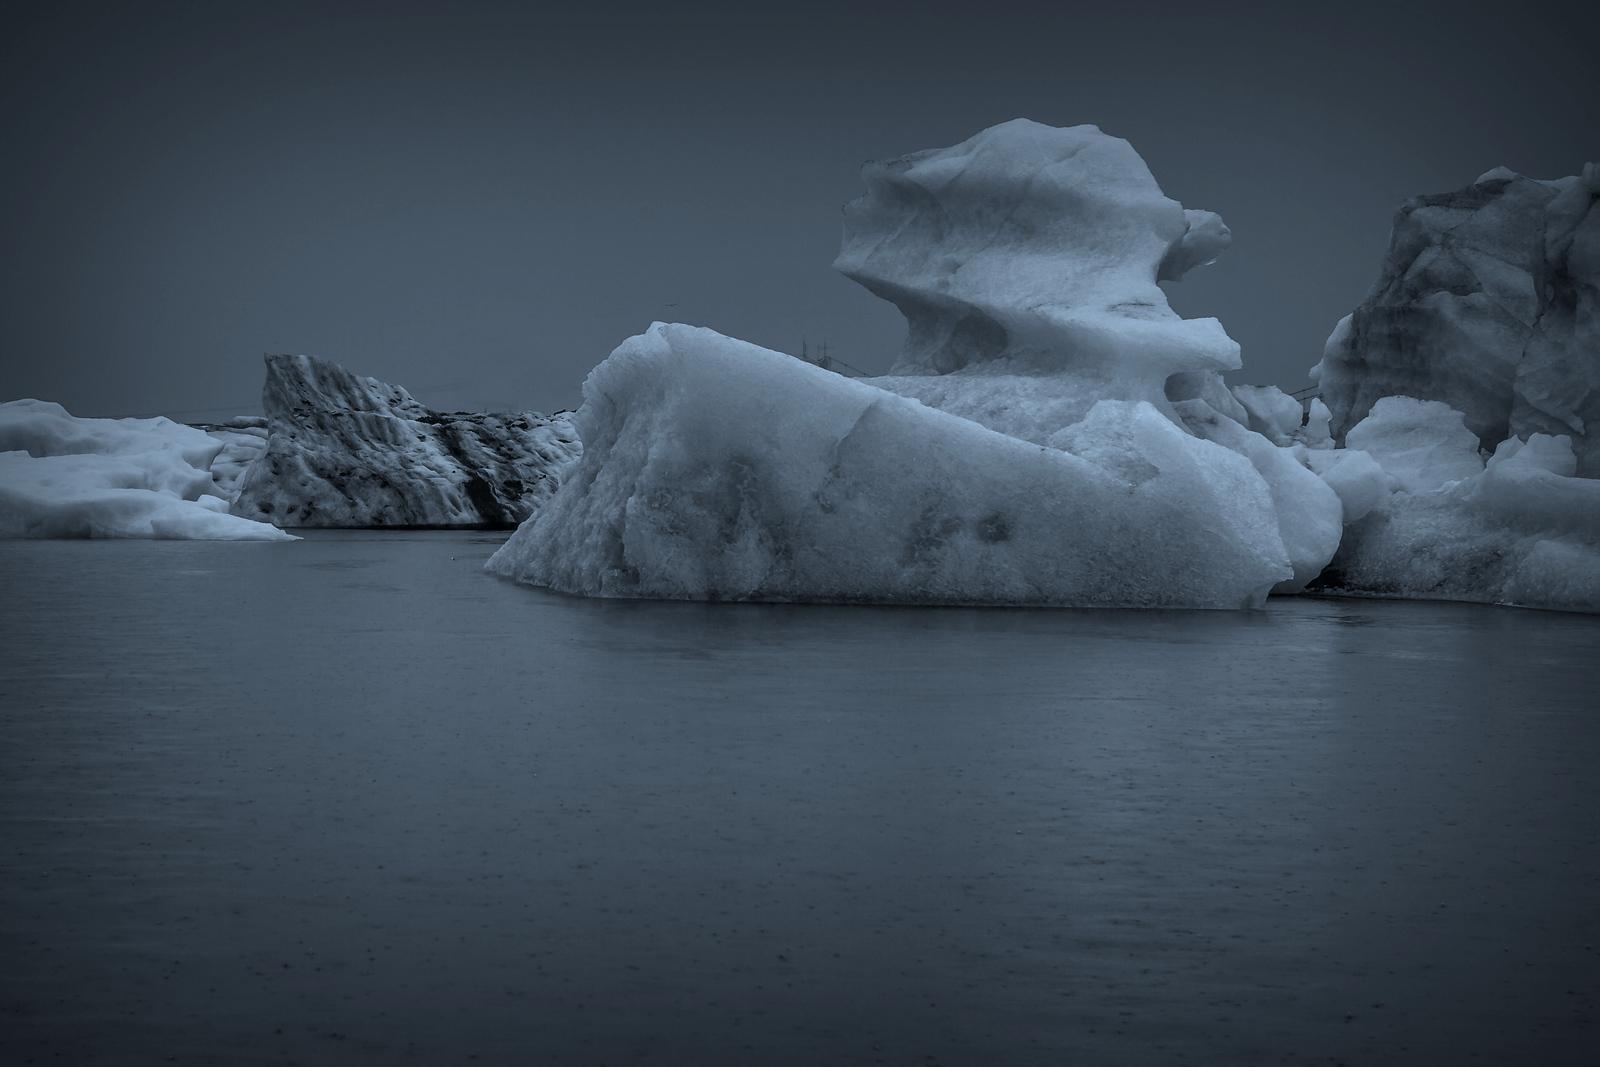 冰岛冰川泻湖(Glacier Lagoon), 湖面上冰川